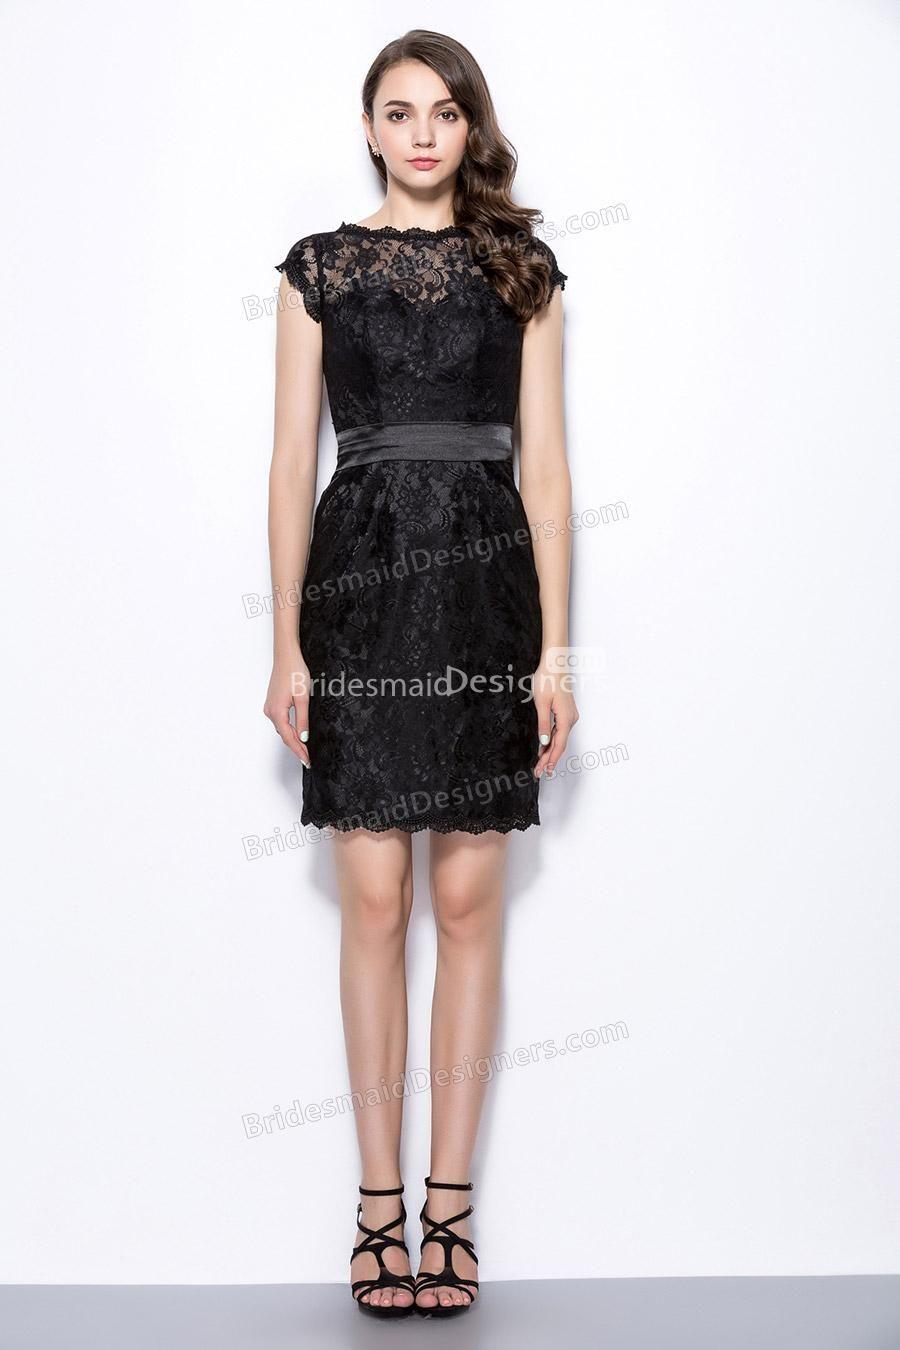 Illusion cap sleeve black sheath shortlacebridesmaiddress cute